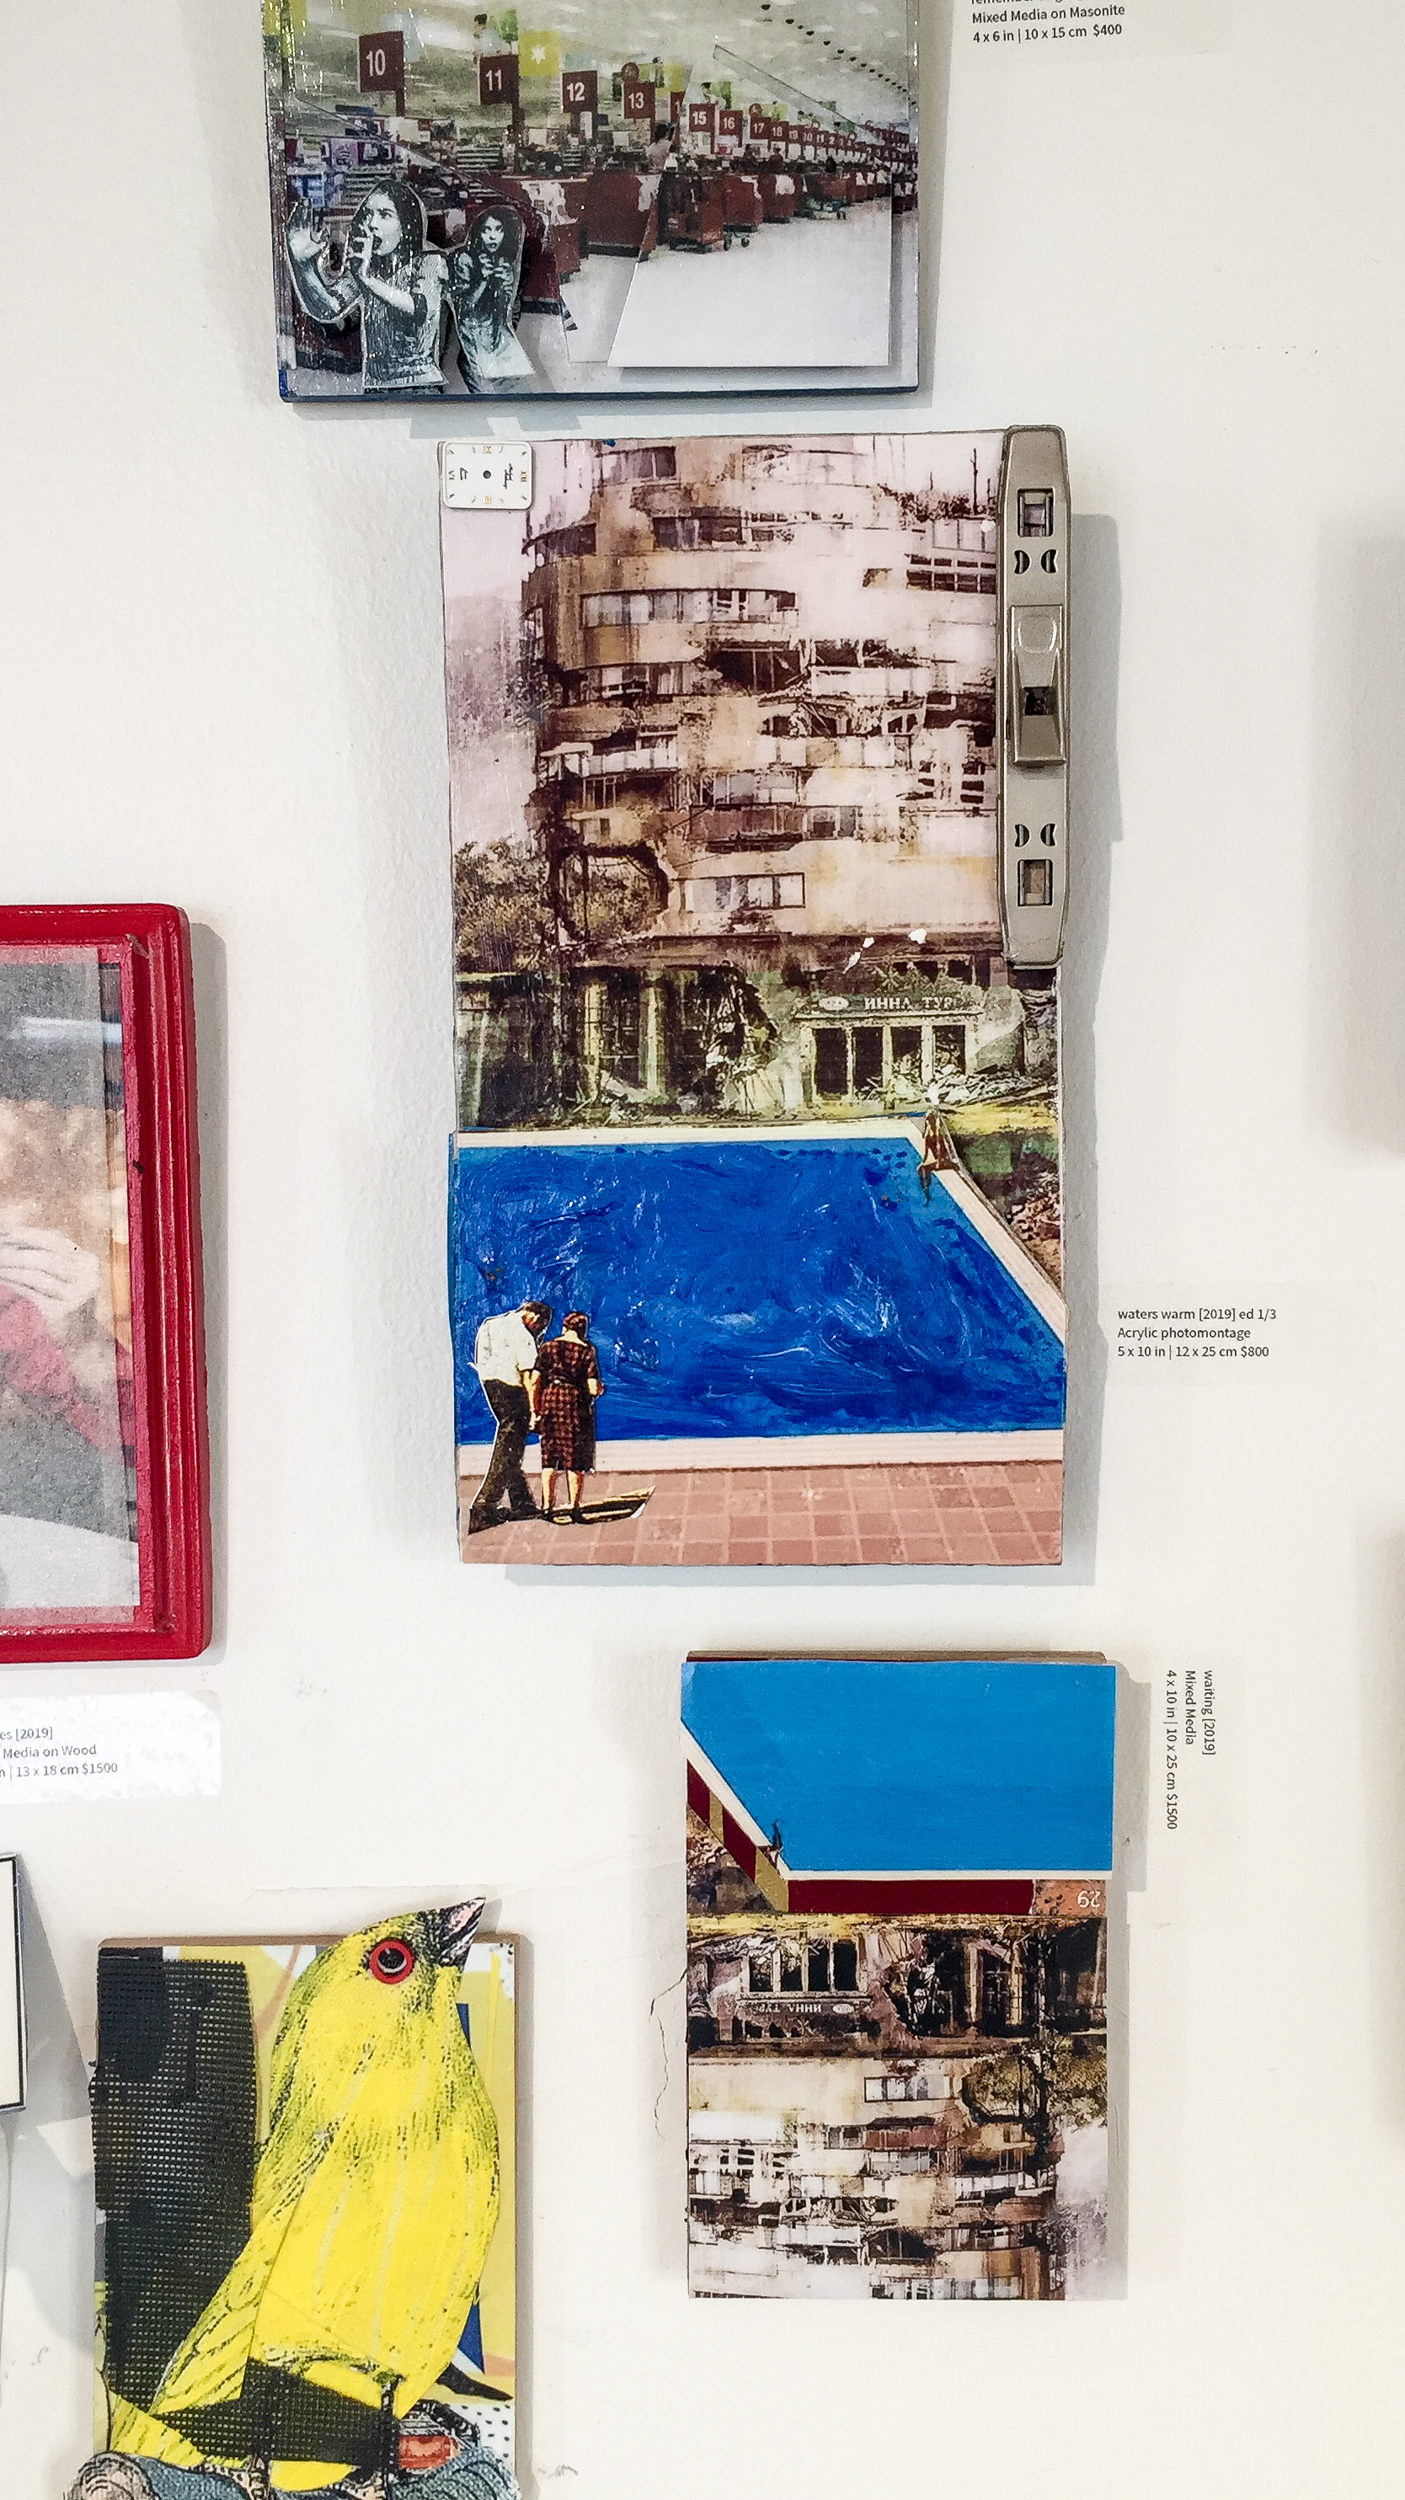 Faena-Exhibition-Images-19.jpg